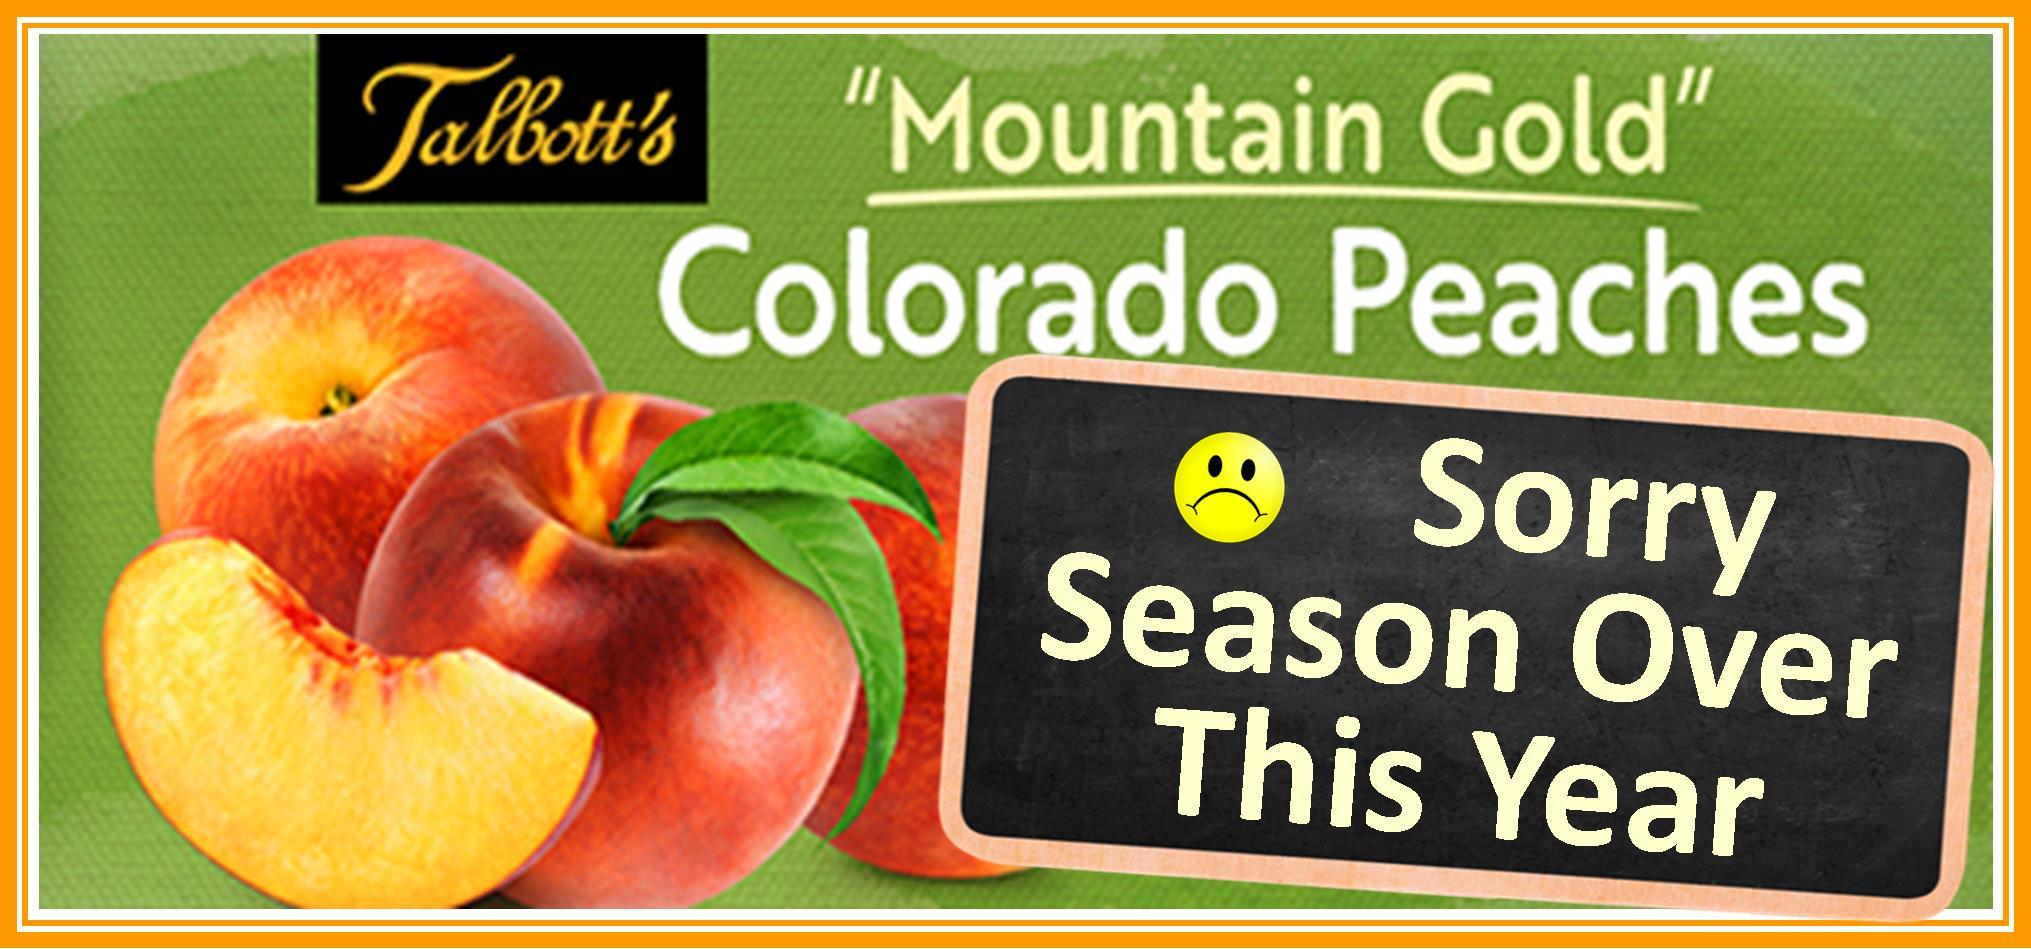 Colo Peach Sorry Season Over.jpg